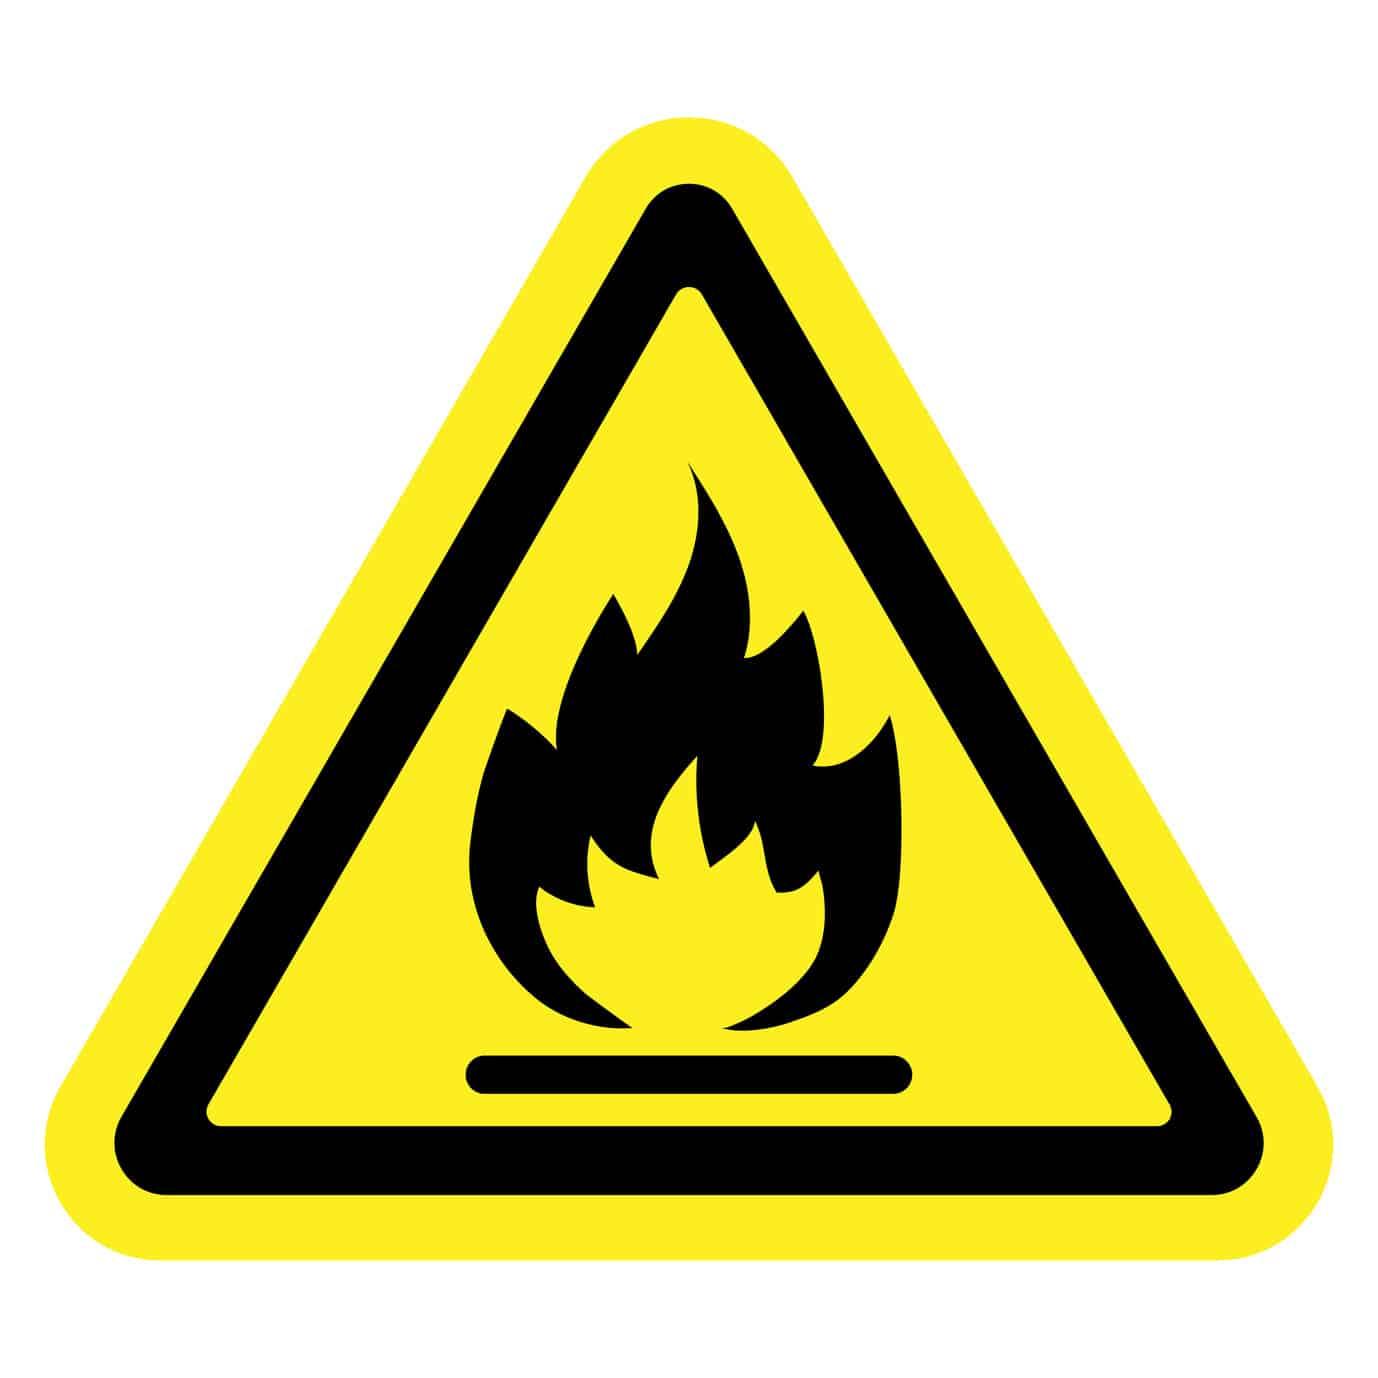 Science Safety Symbols